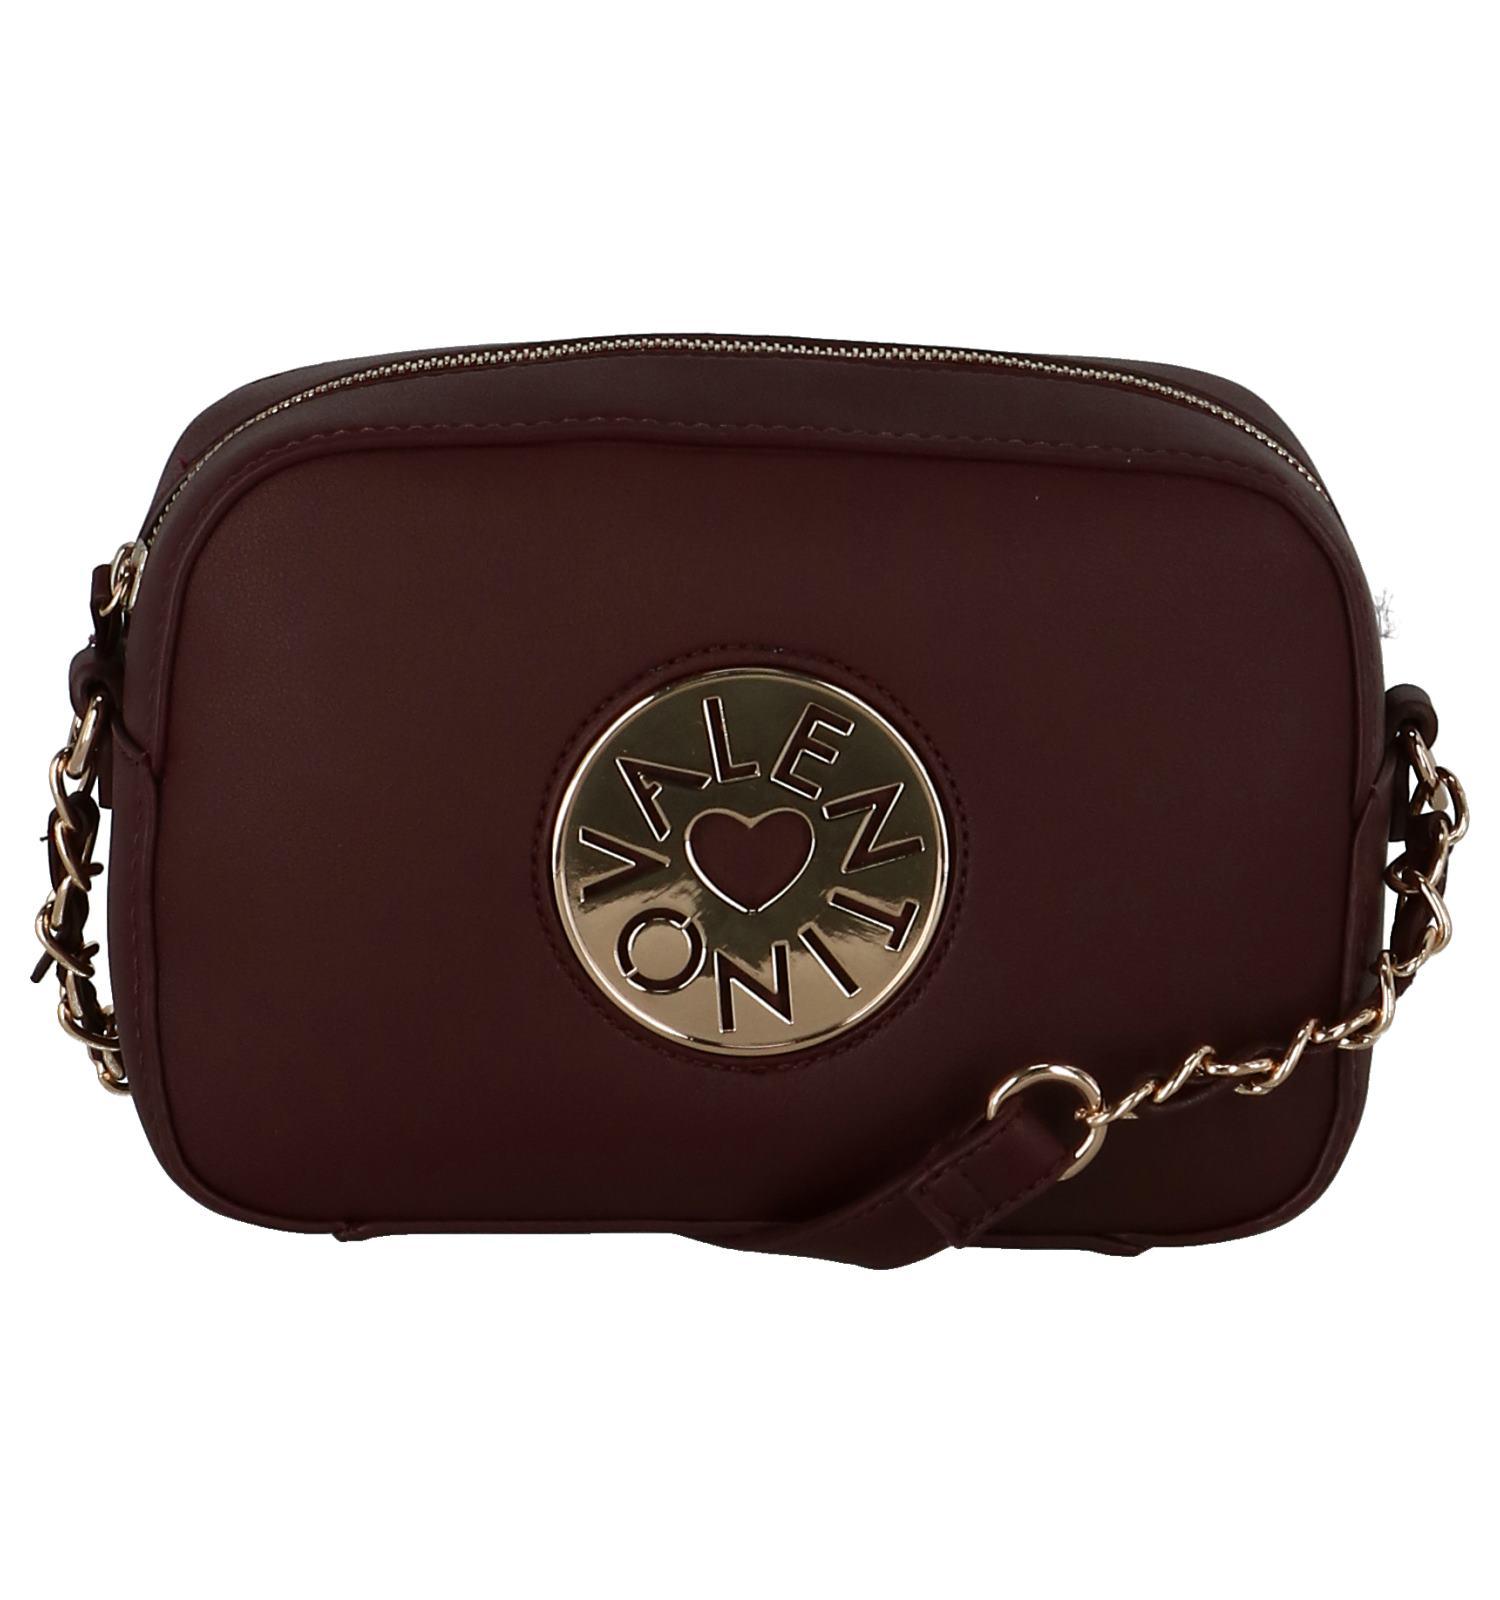 be Crossbody Olympia Handbags Torfs Bordeaux Valentino Tas BqYztZxw